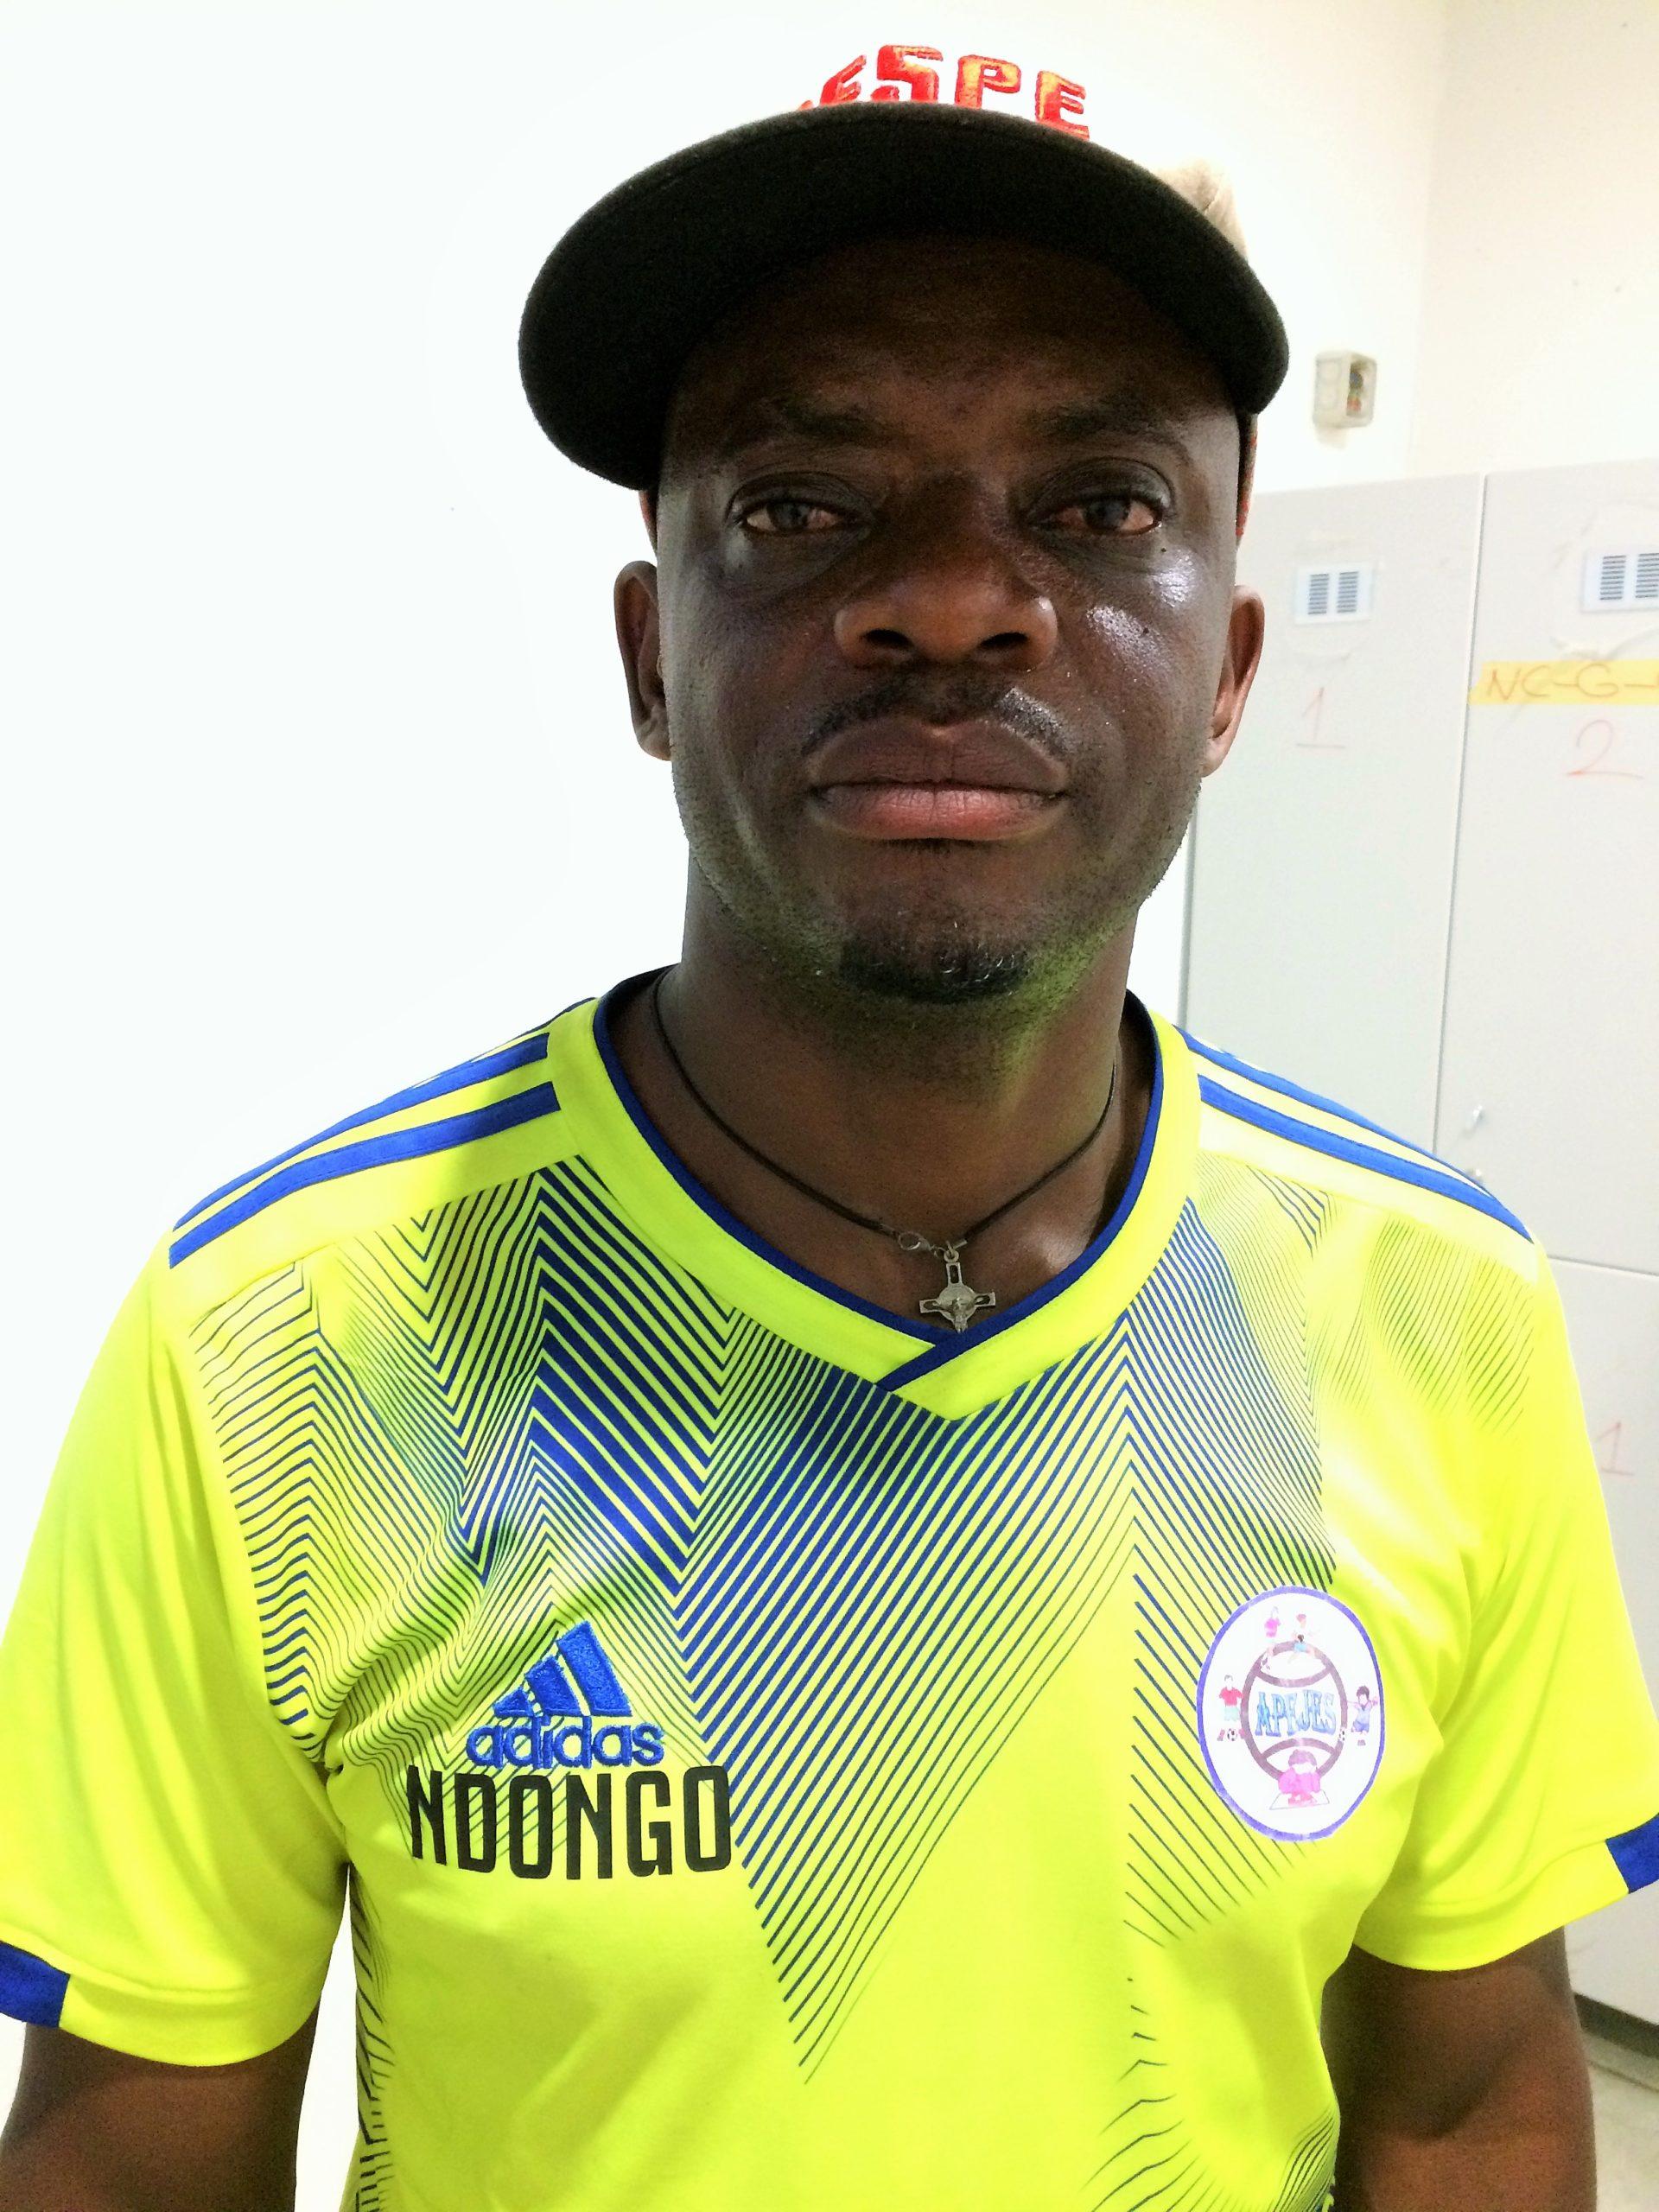 Ema Ndongo, coach de Apejes de Mfou. Photo: Moustapha Oumarou